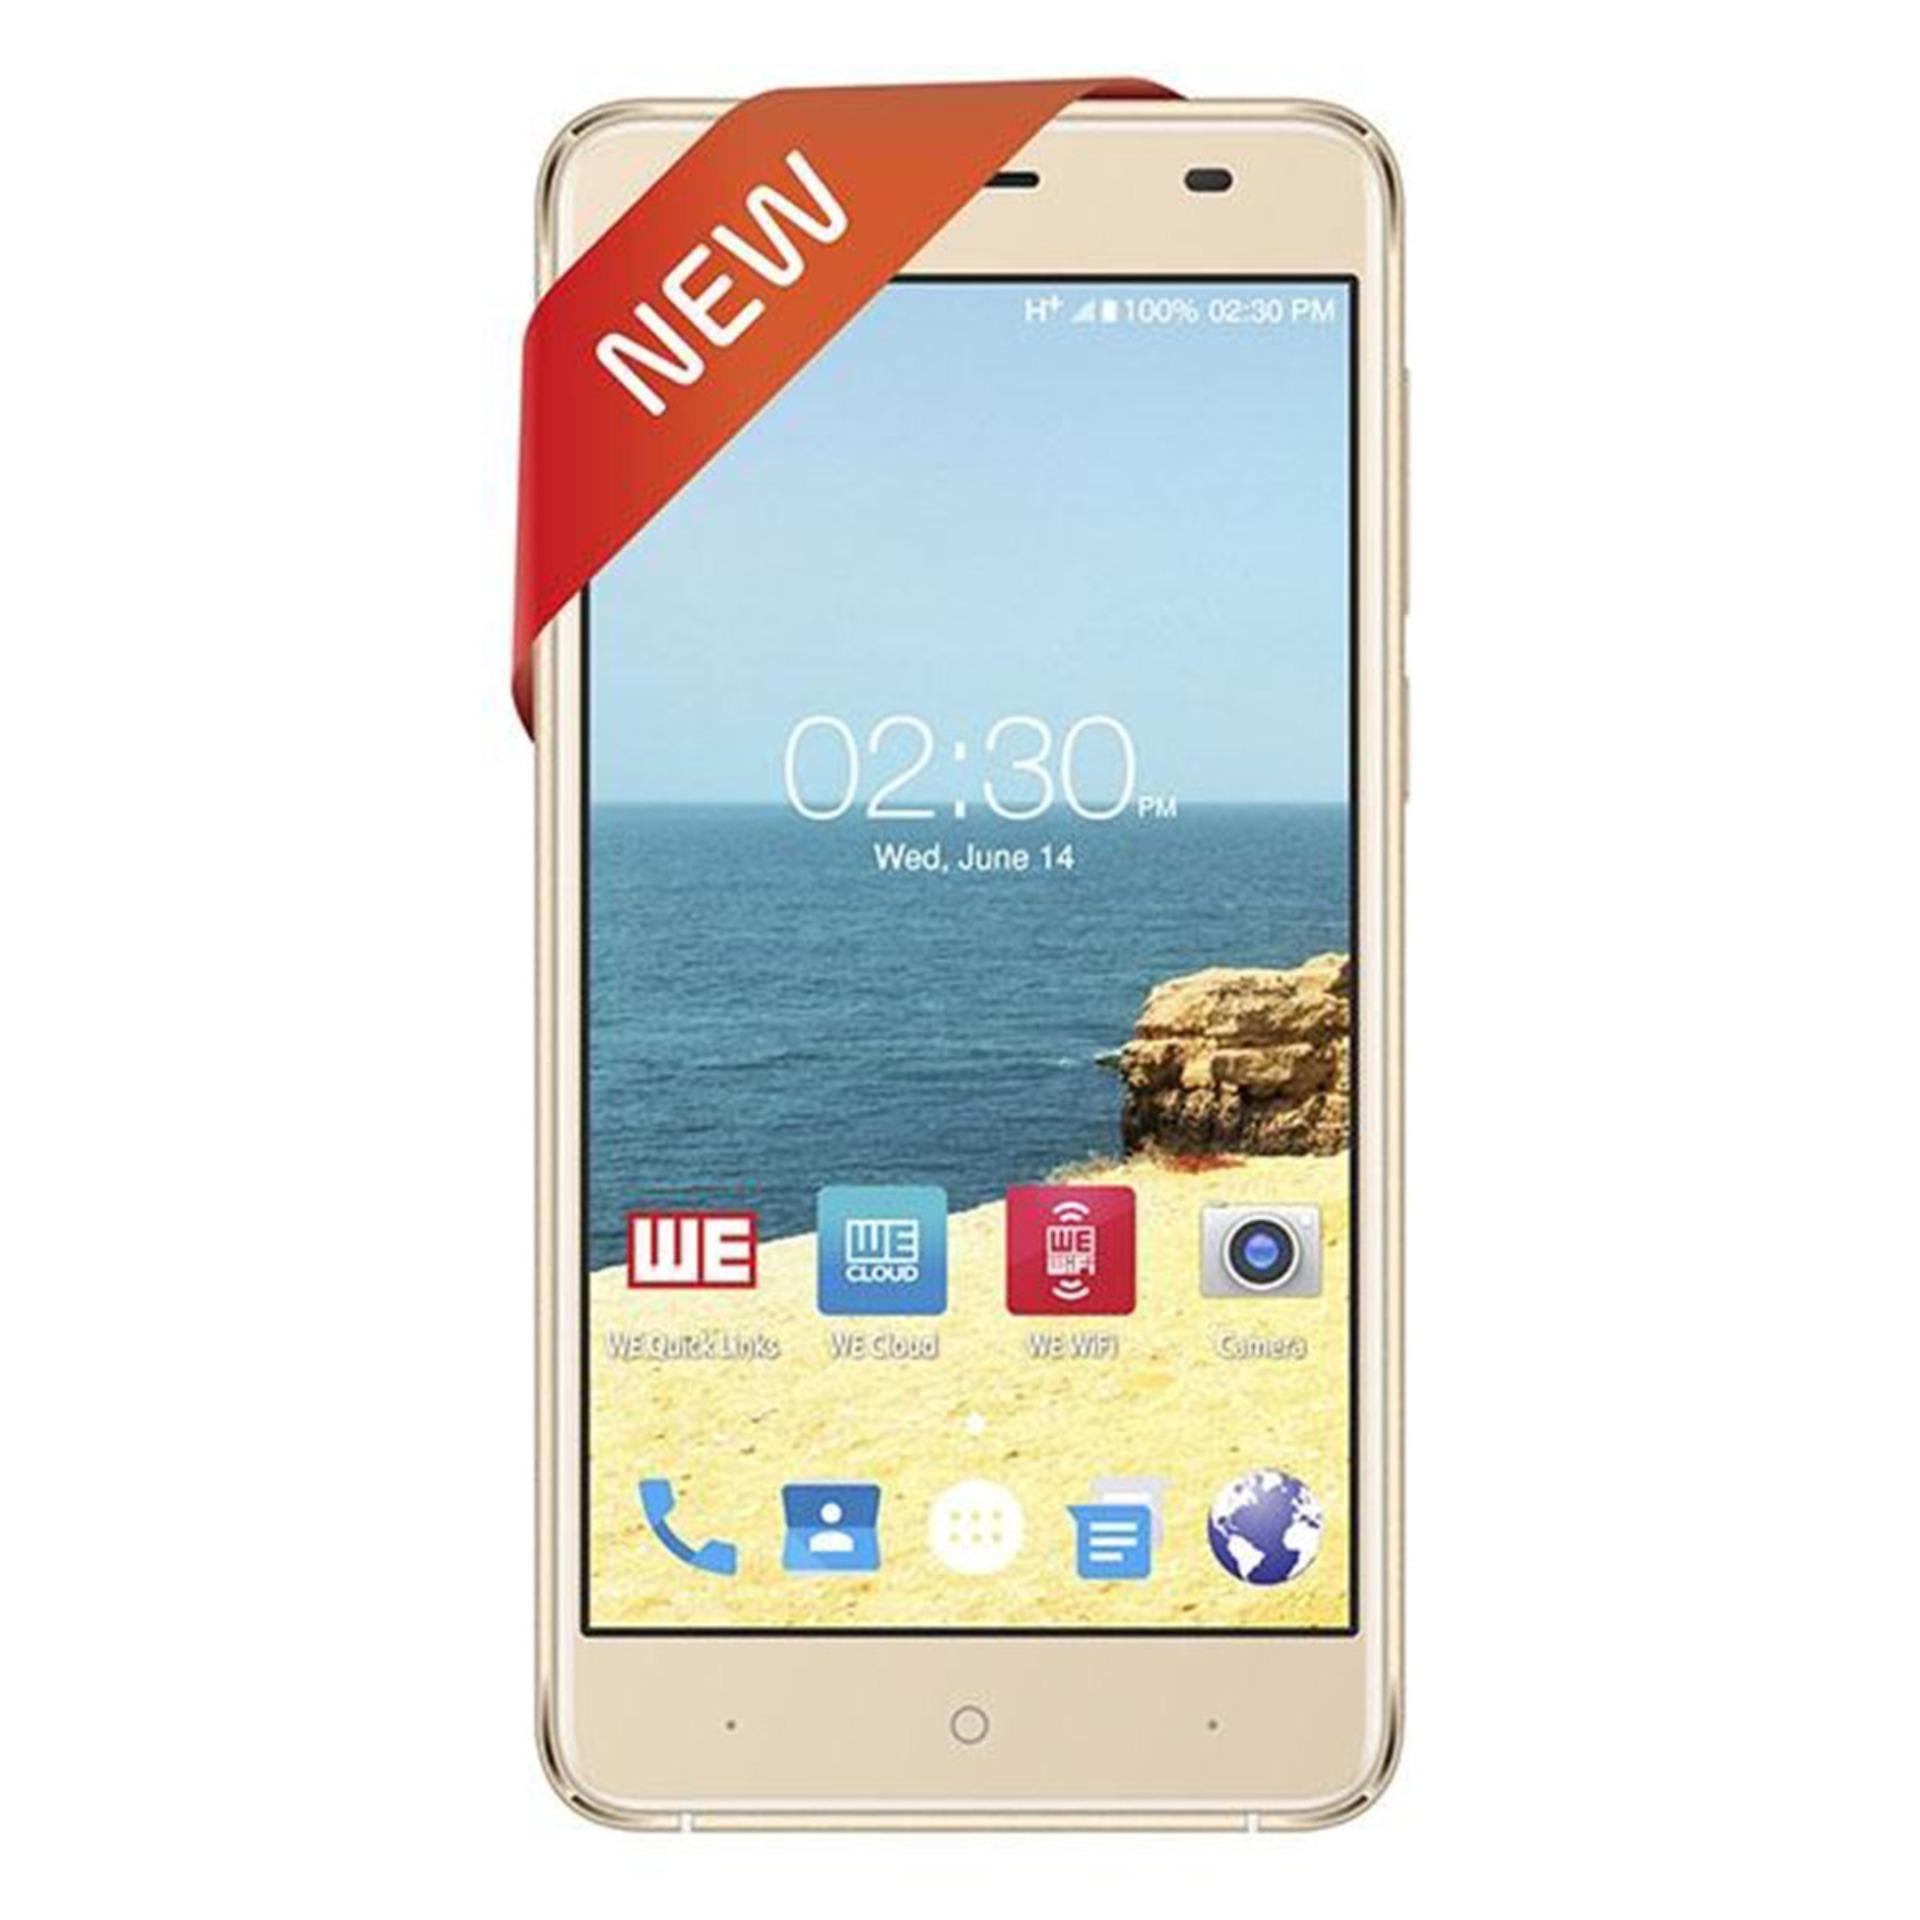 Mikrotikwe Buy At Best Price In Bangladesh Www Rb941 2nd Tc We L8 Smartphone 5 1gb Ram 8gb Rom 5mp Camera